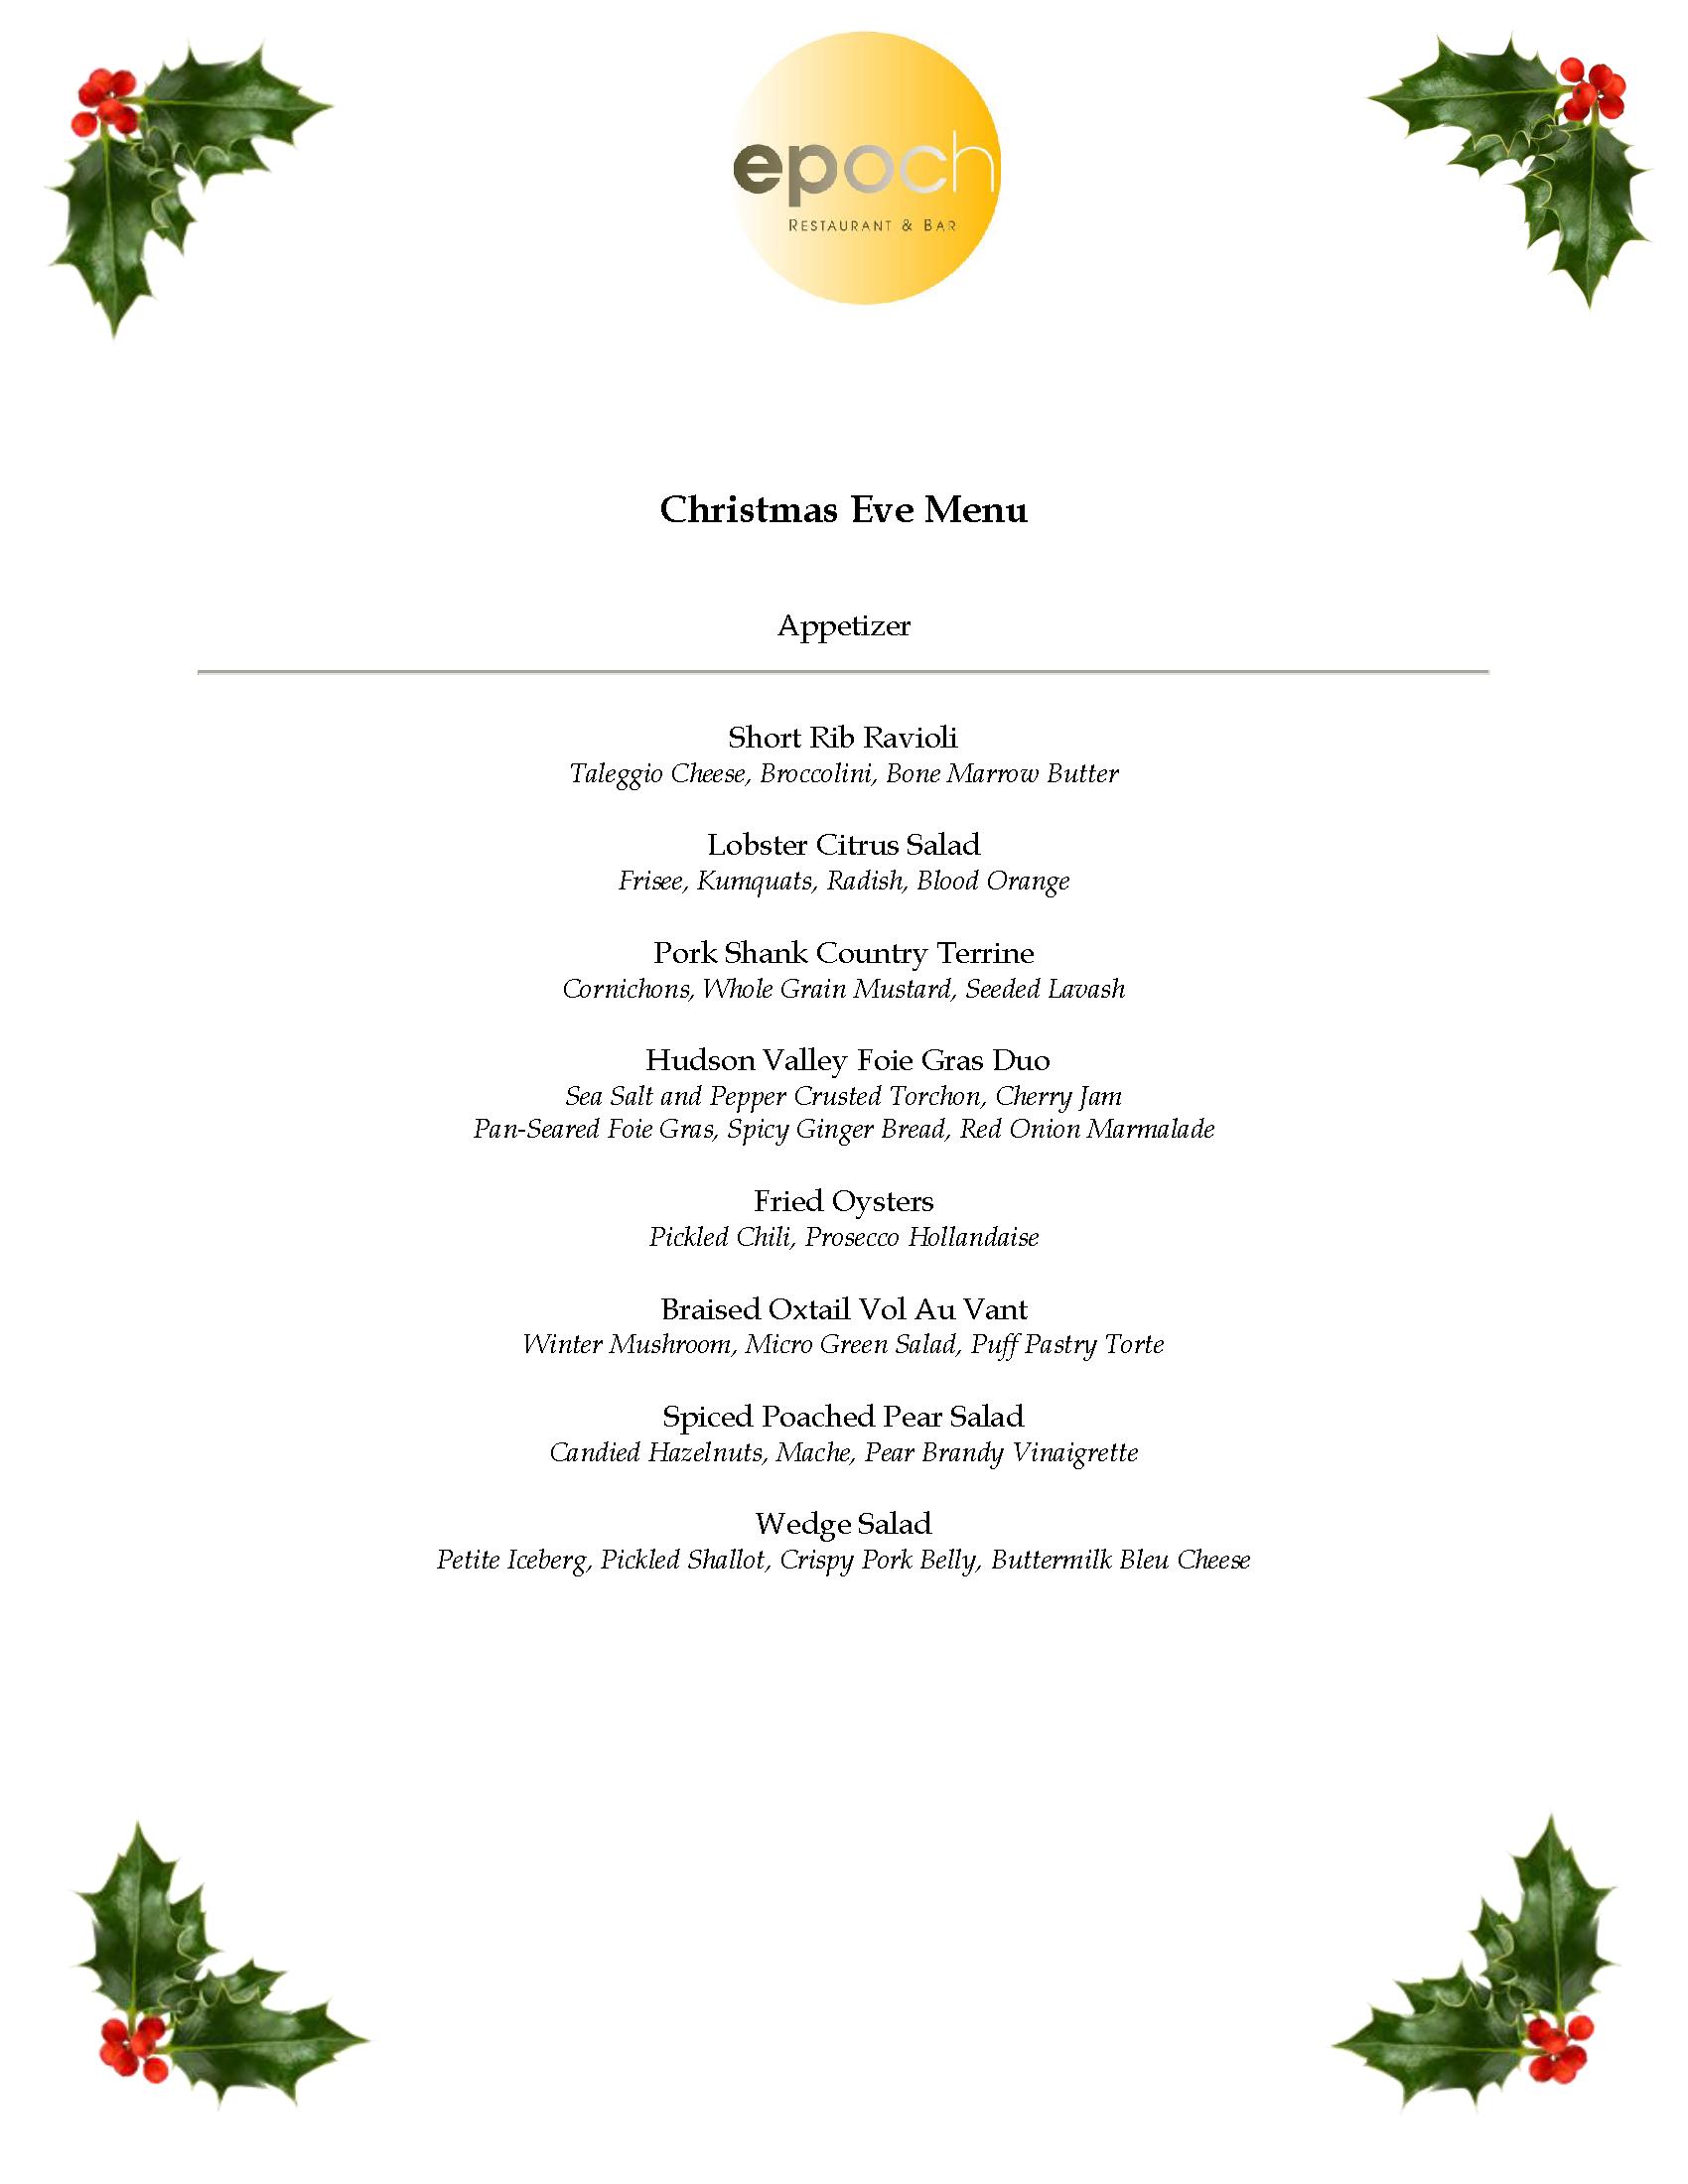 Christmas Eve Dinner Menu.Christmas Eve Dinner Menu 2013 Epoch Restaurant Bar Page 1 Epoch